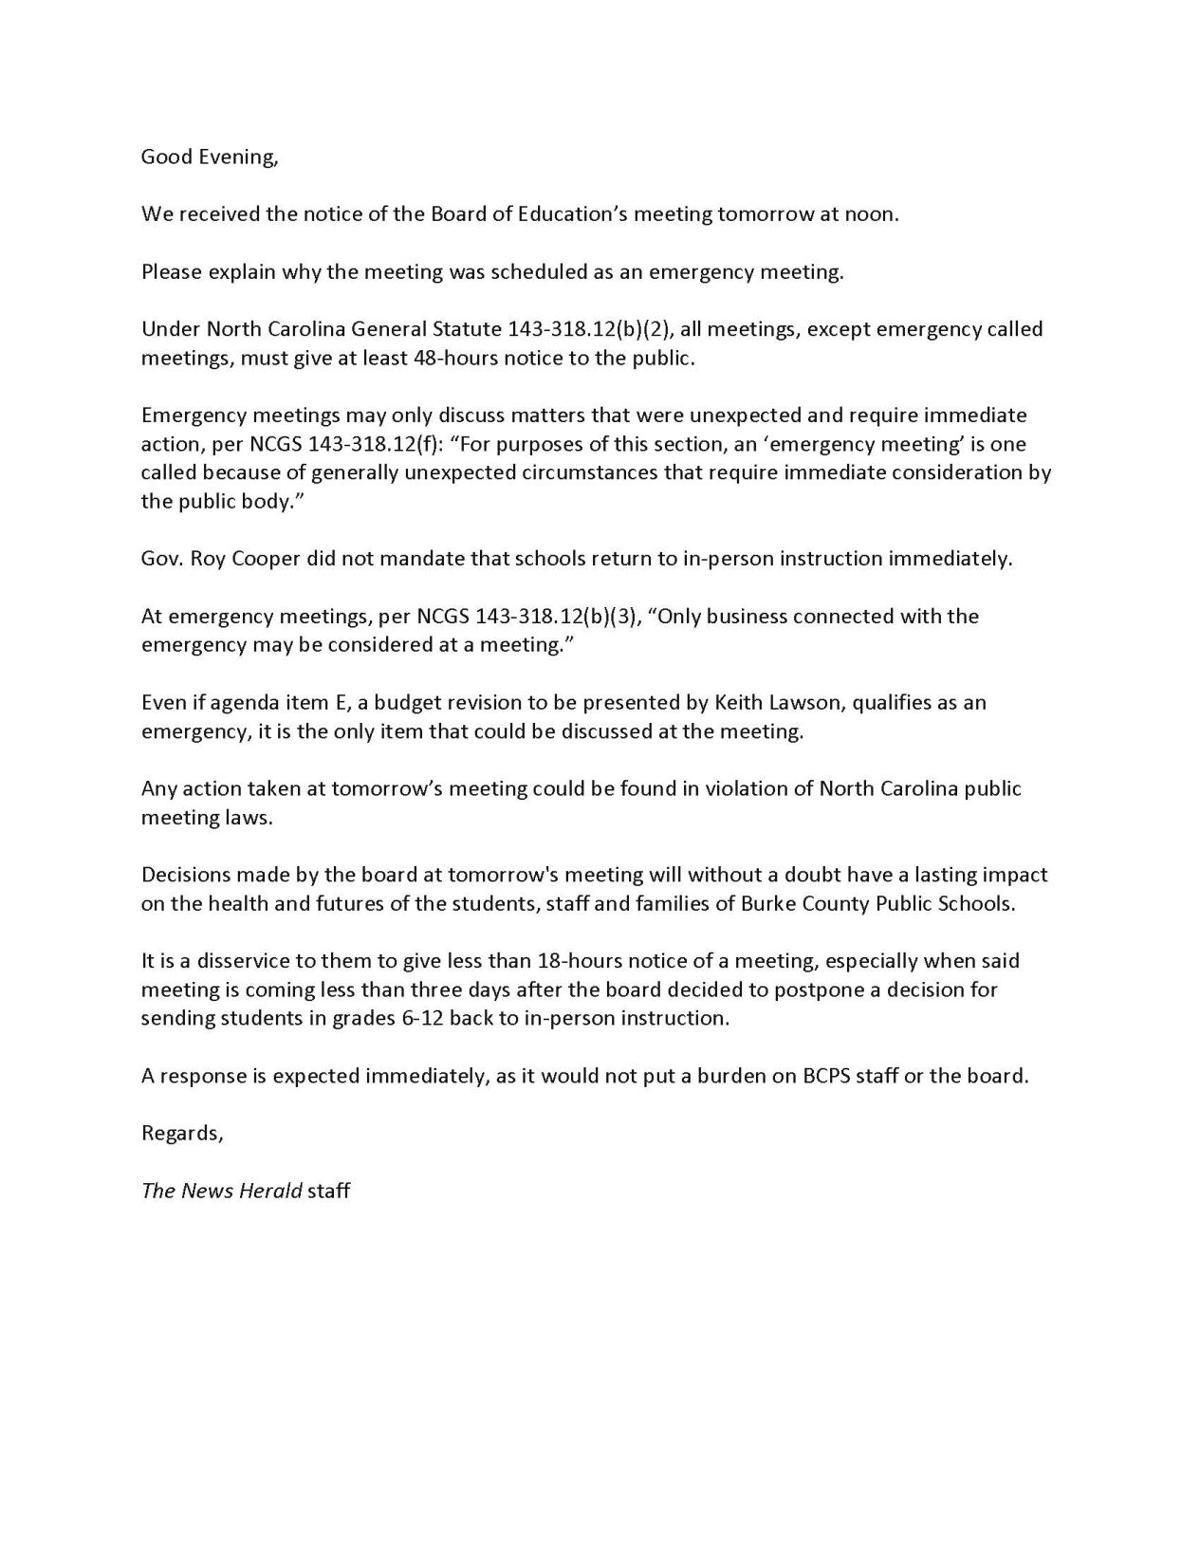 News Herald emergency meeting rebuttal